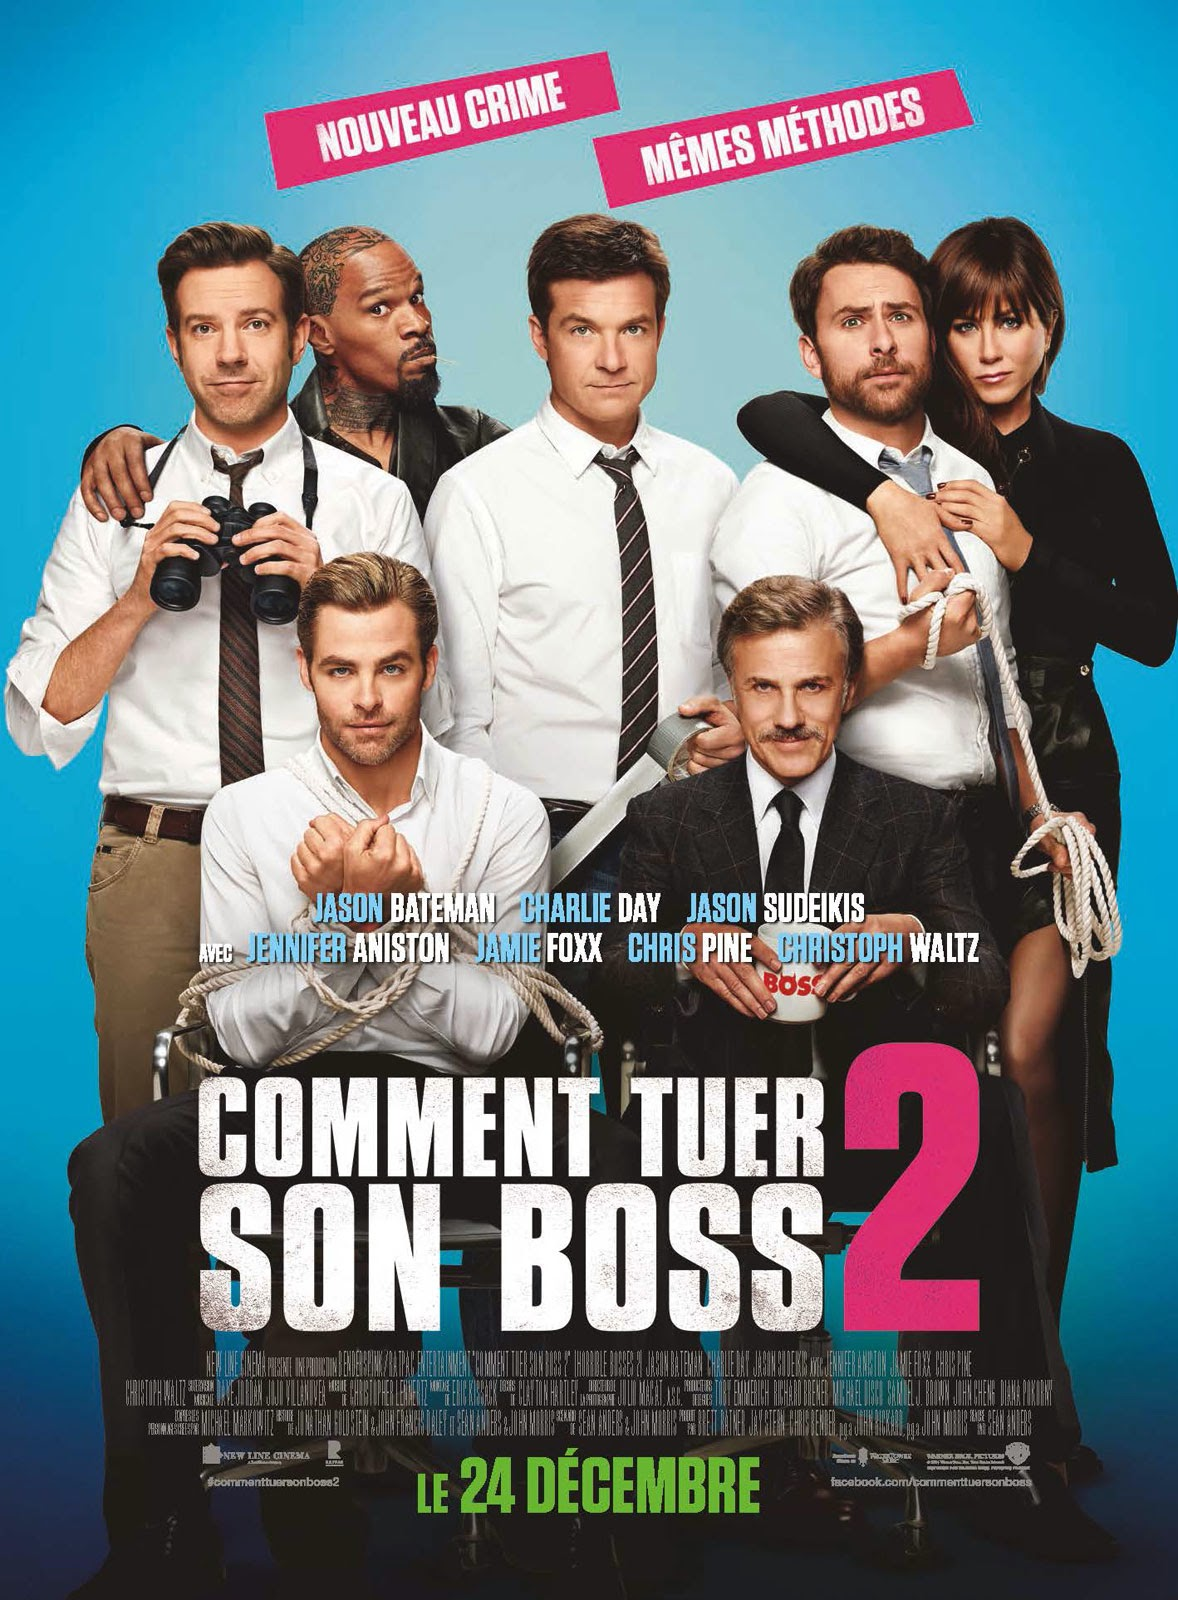 http://fuckingcinephiles.blogspot.fr/2014/12/critique-comment-tuer-son-boss-2.html